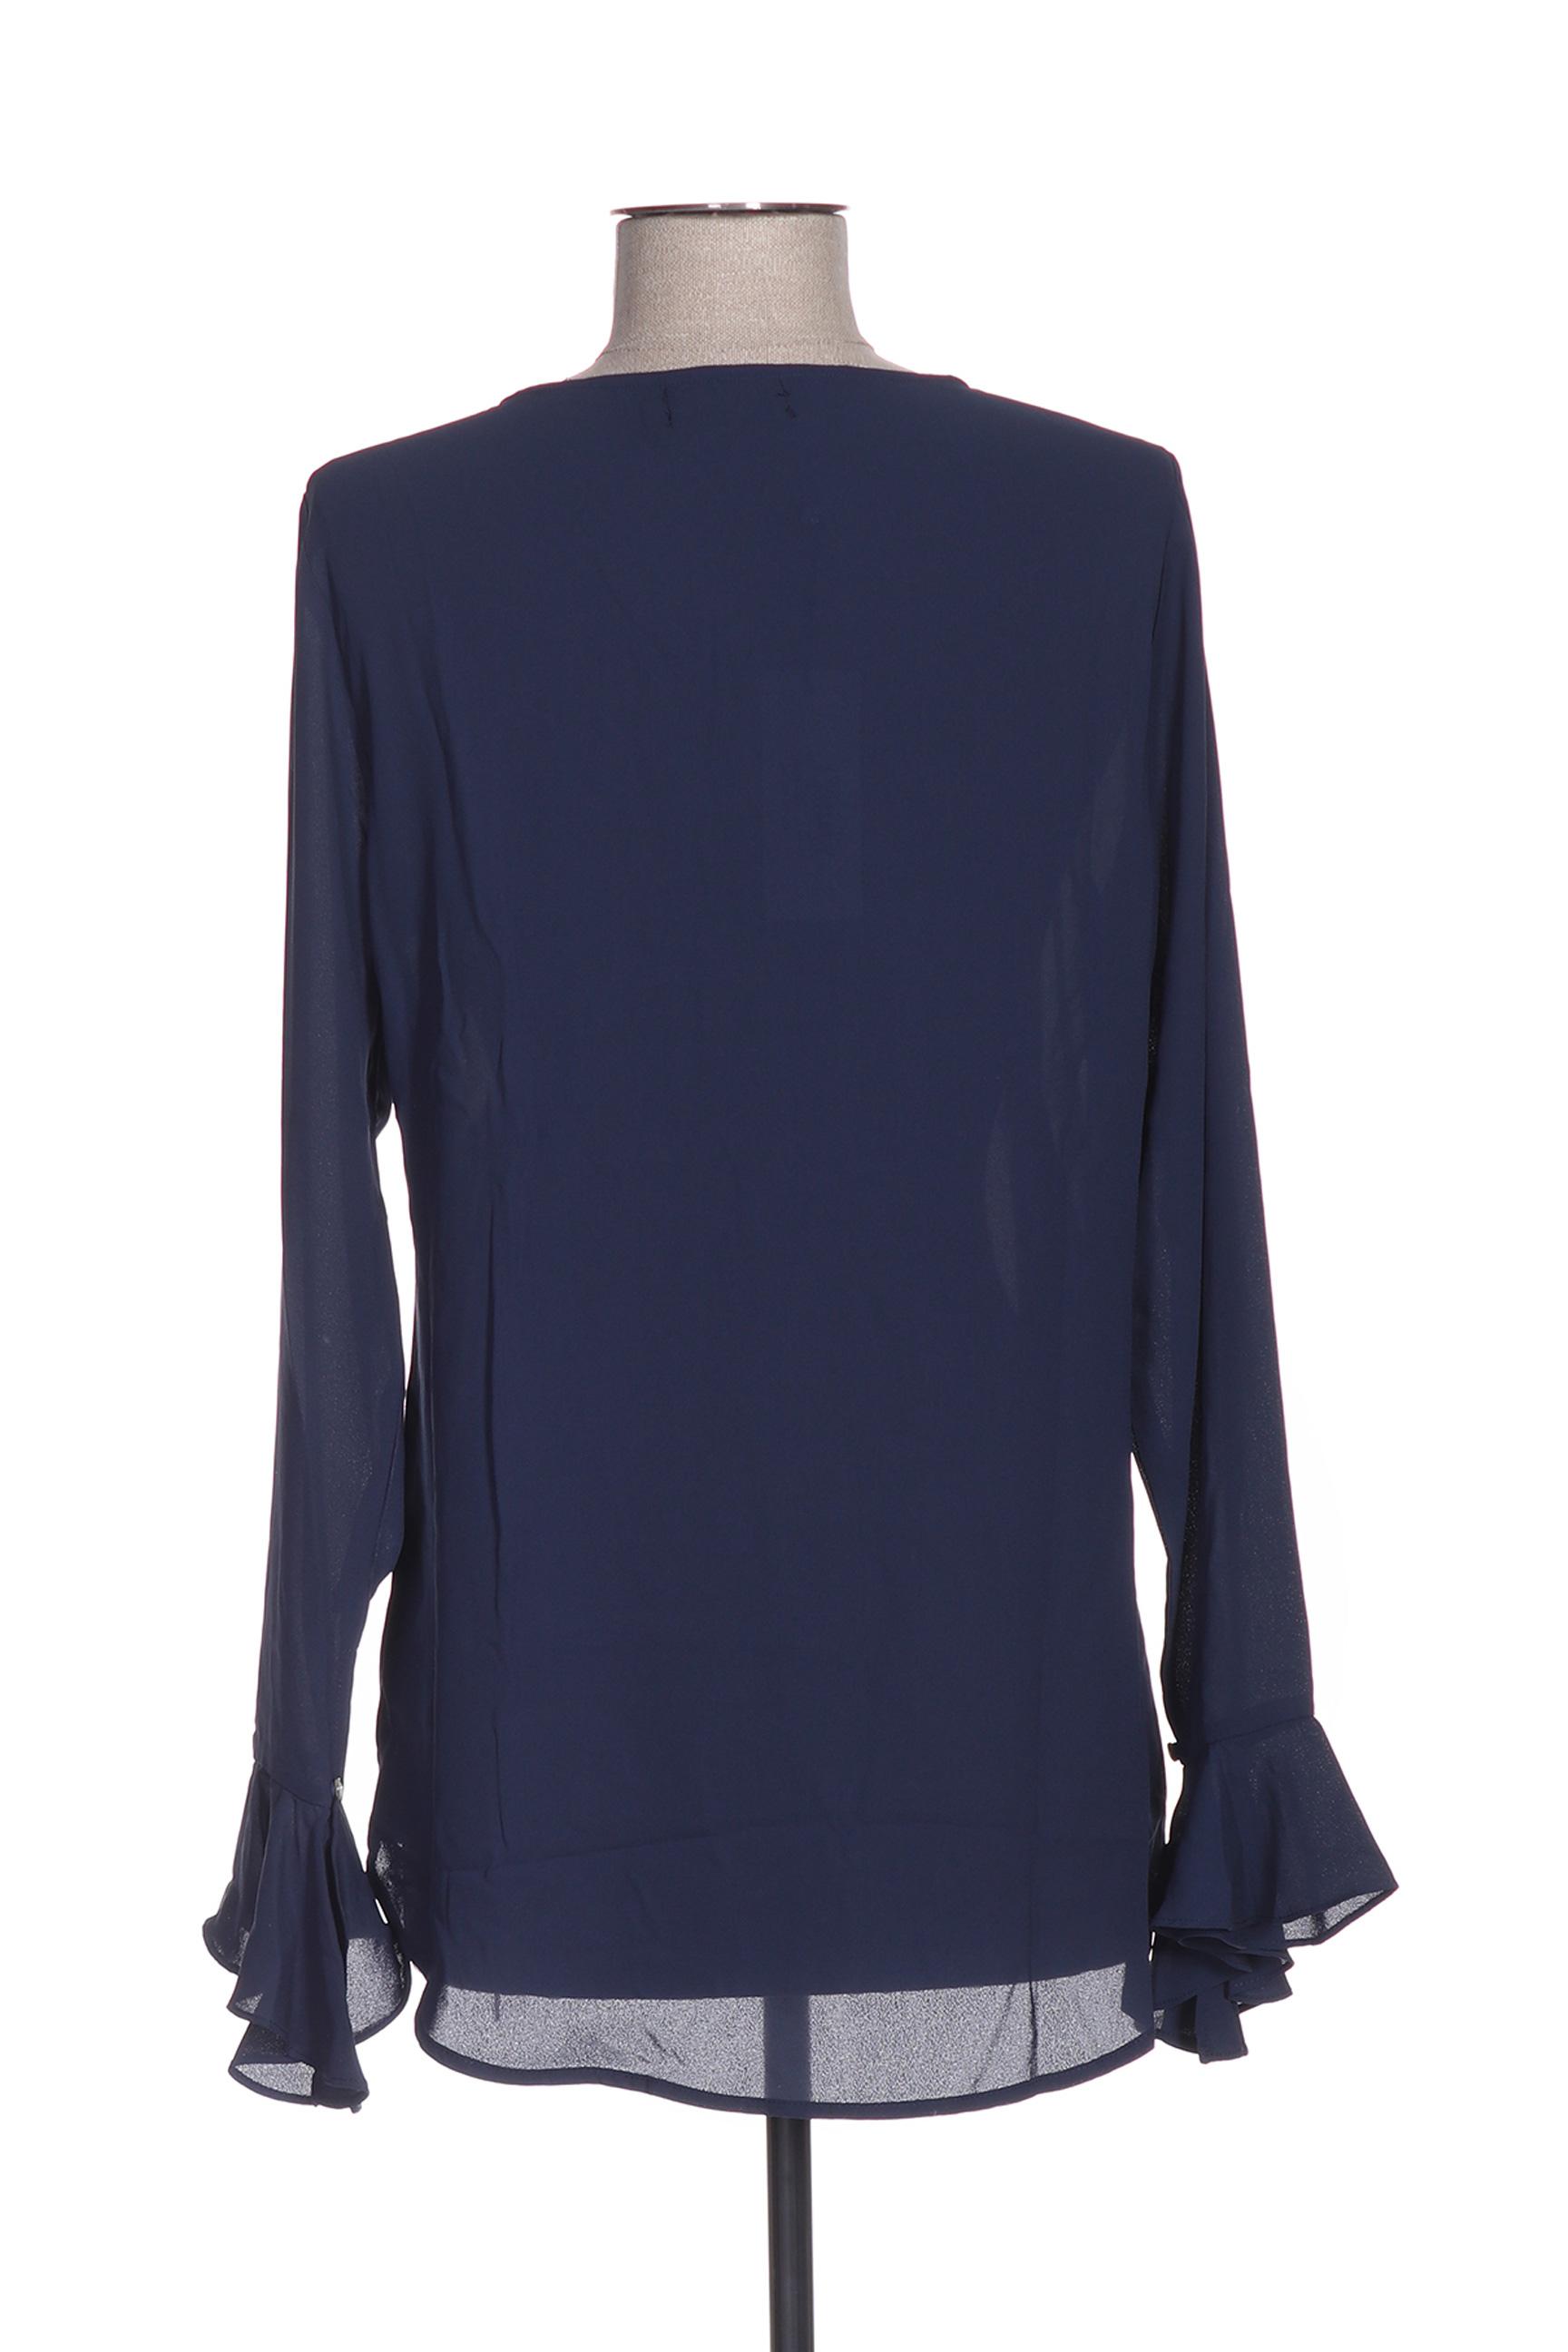 Molly Bracken Blouses Femme De Couleur Bleu En Soldes Pas Cher 1426951-bleu00